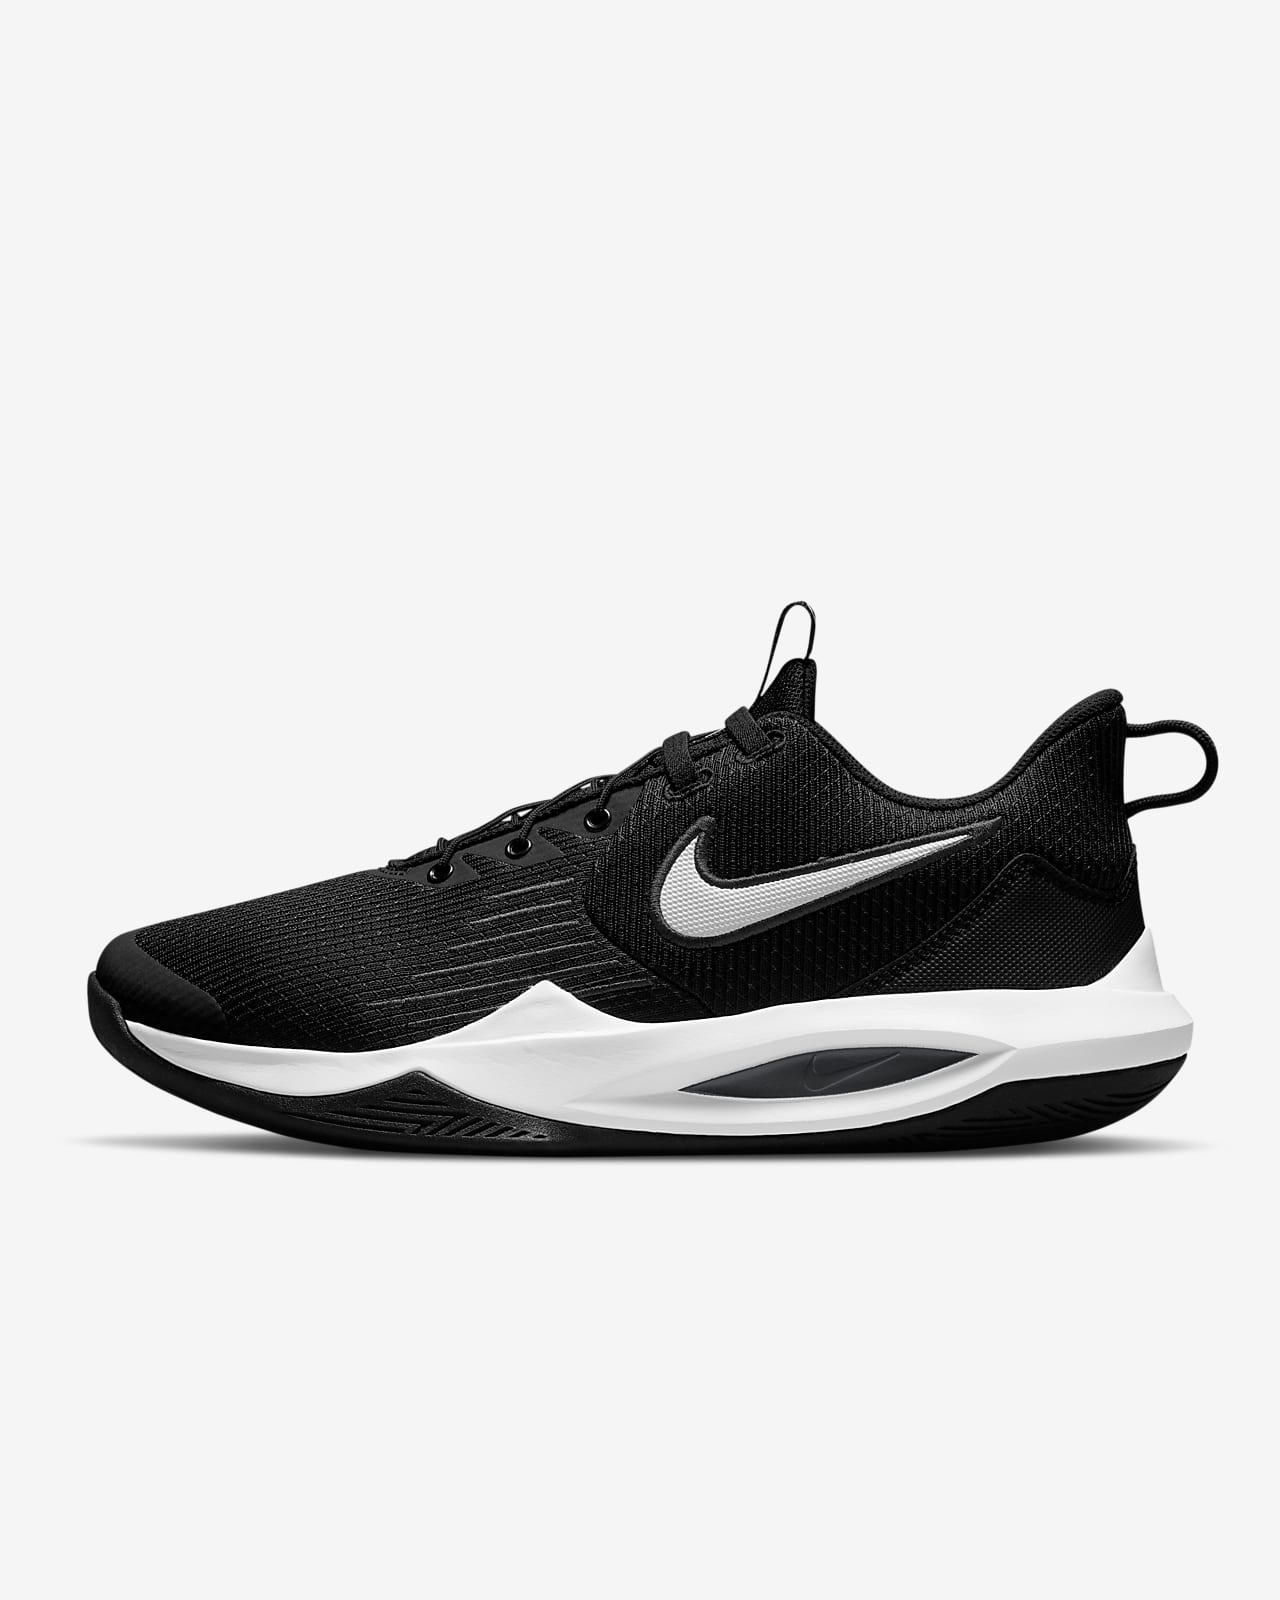 Nike Precision 5 FlyEase Basketball Shoe